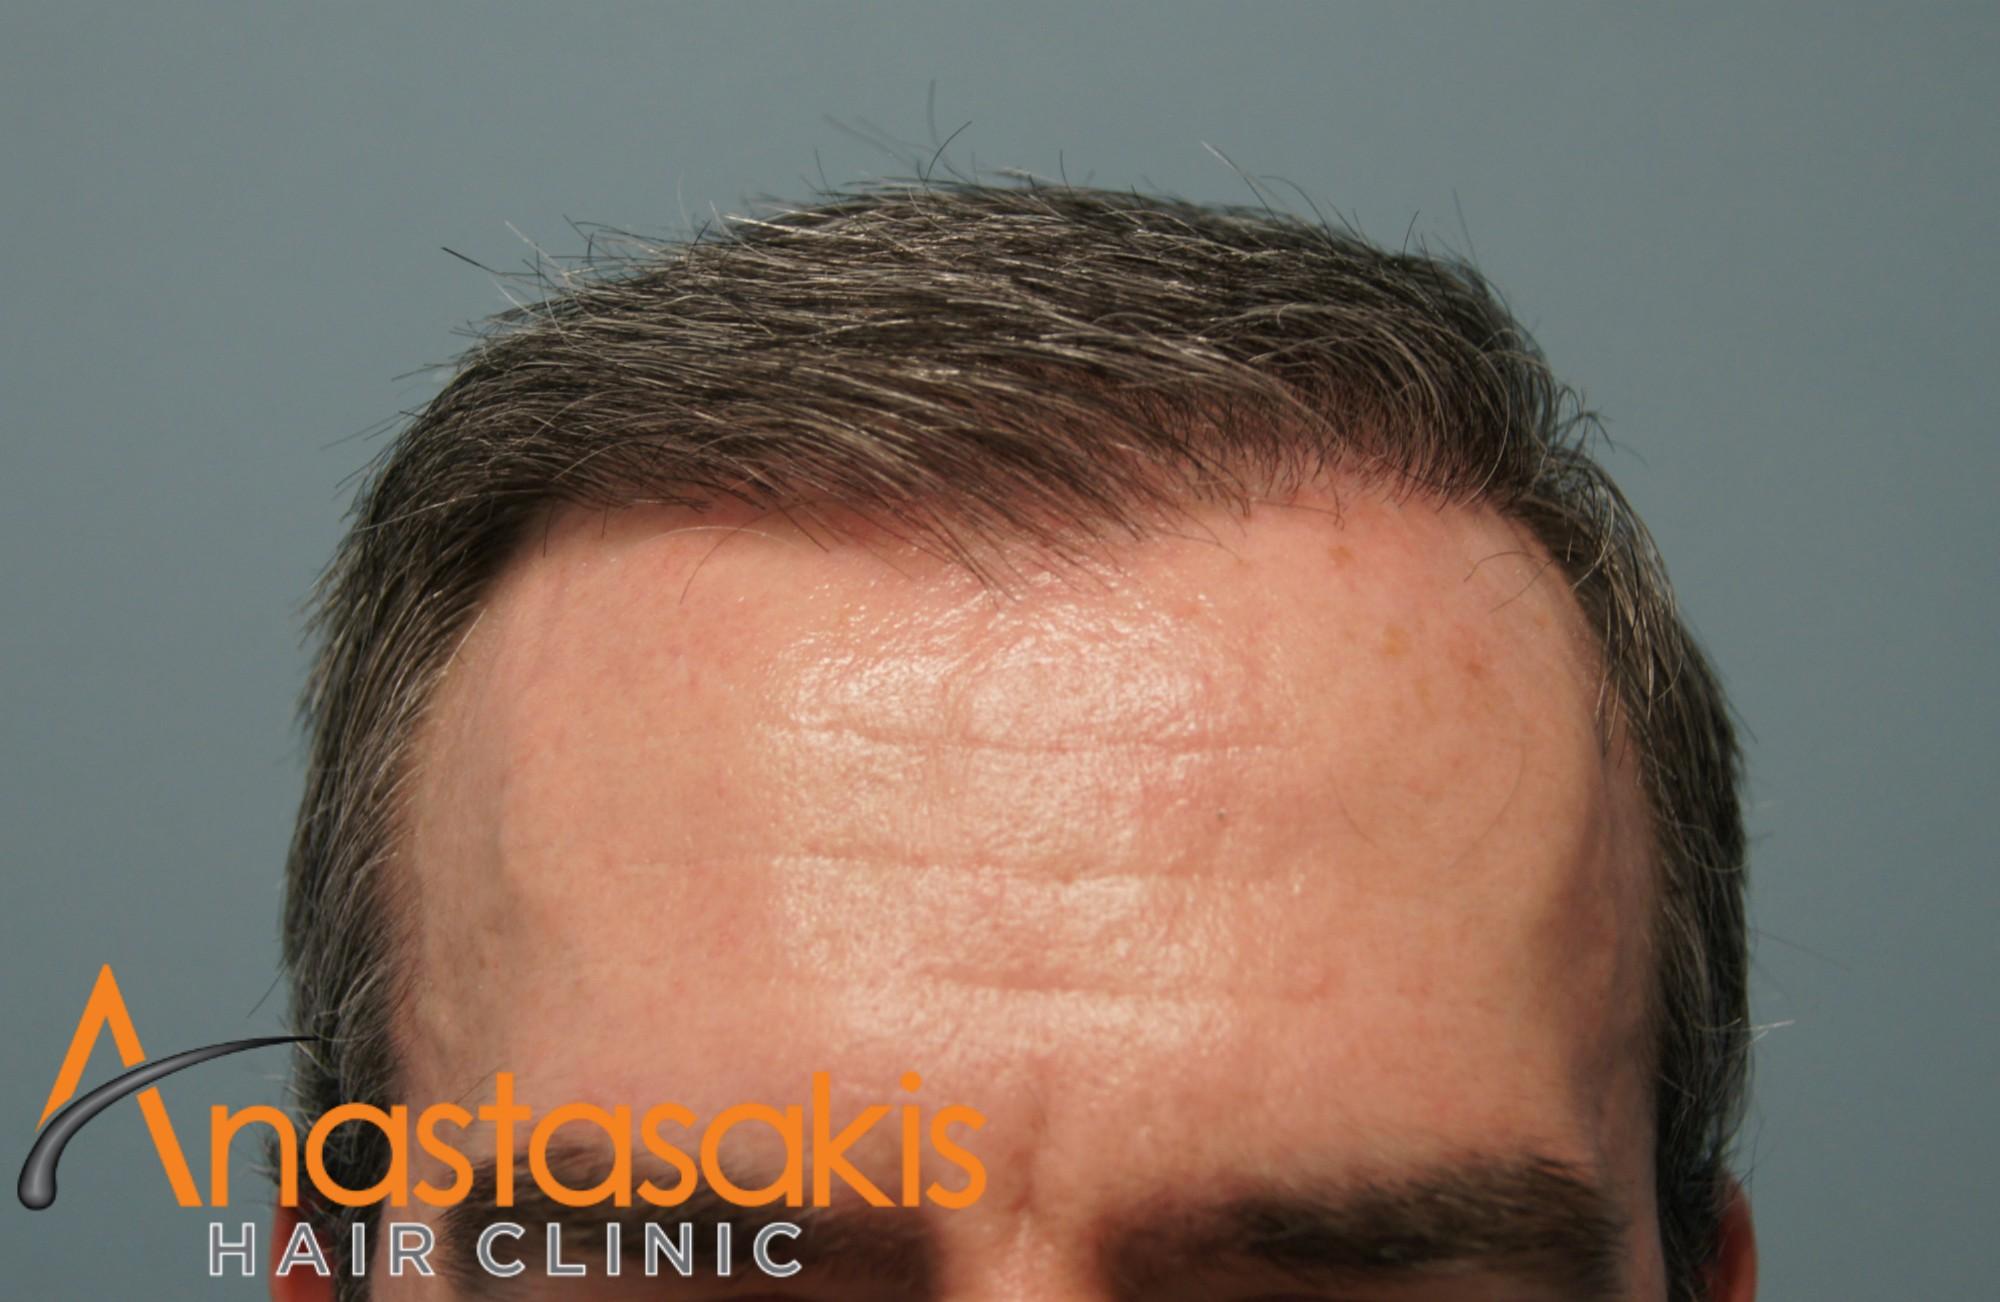 3050fus-result-anastasakis-hair-clinic-fut